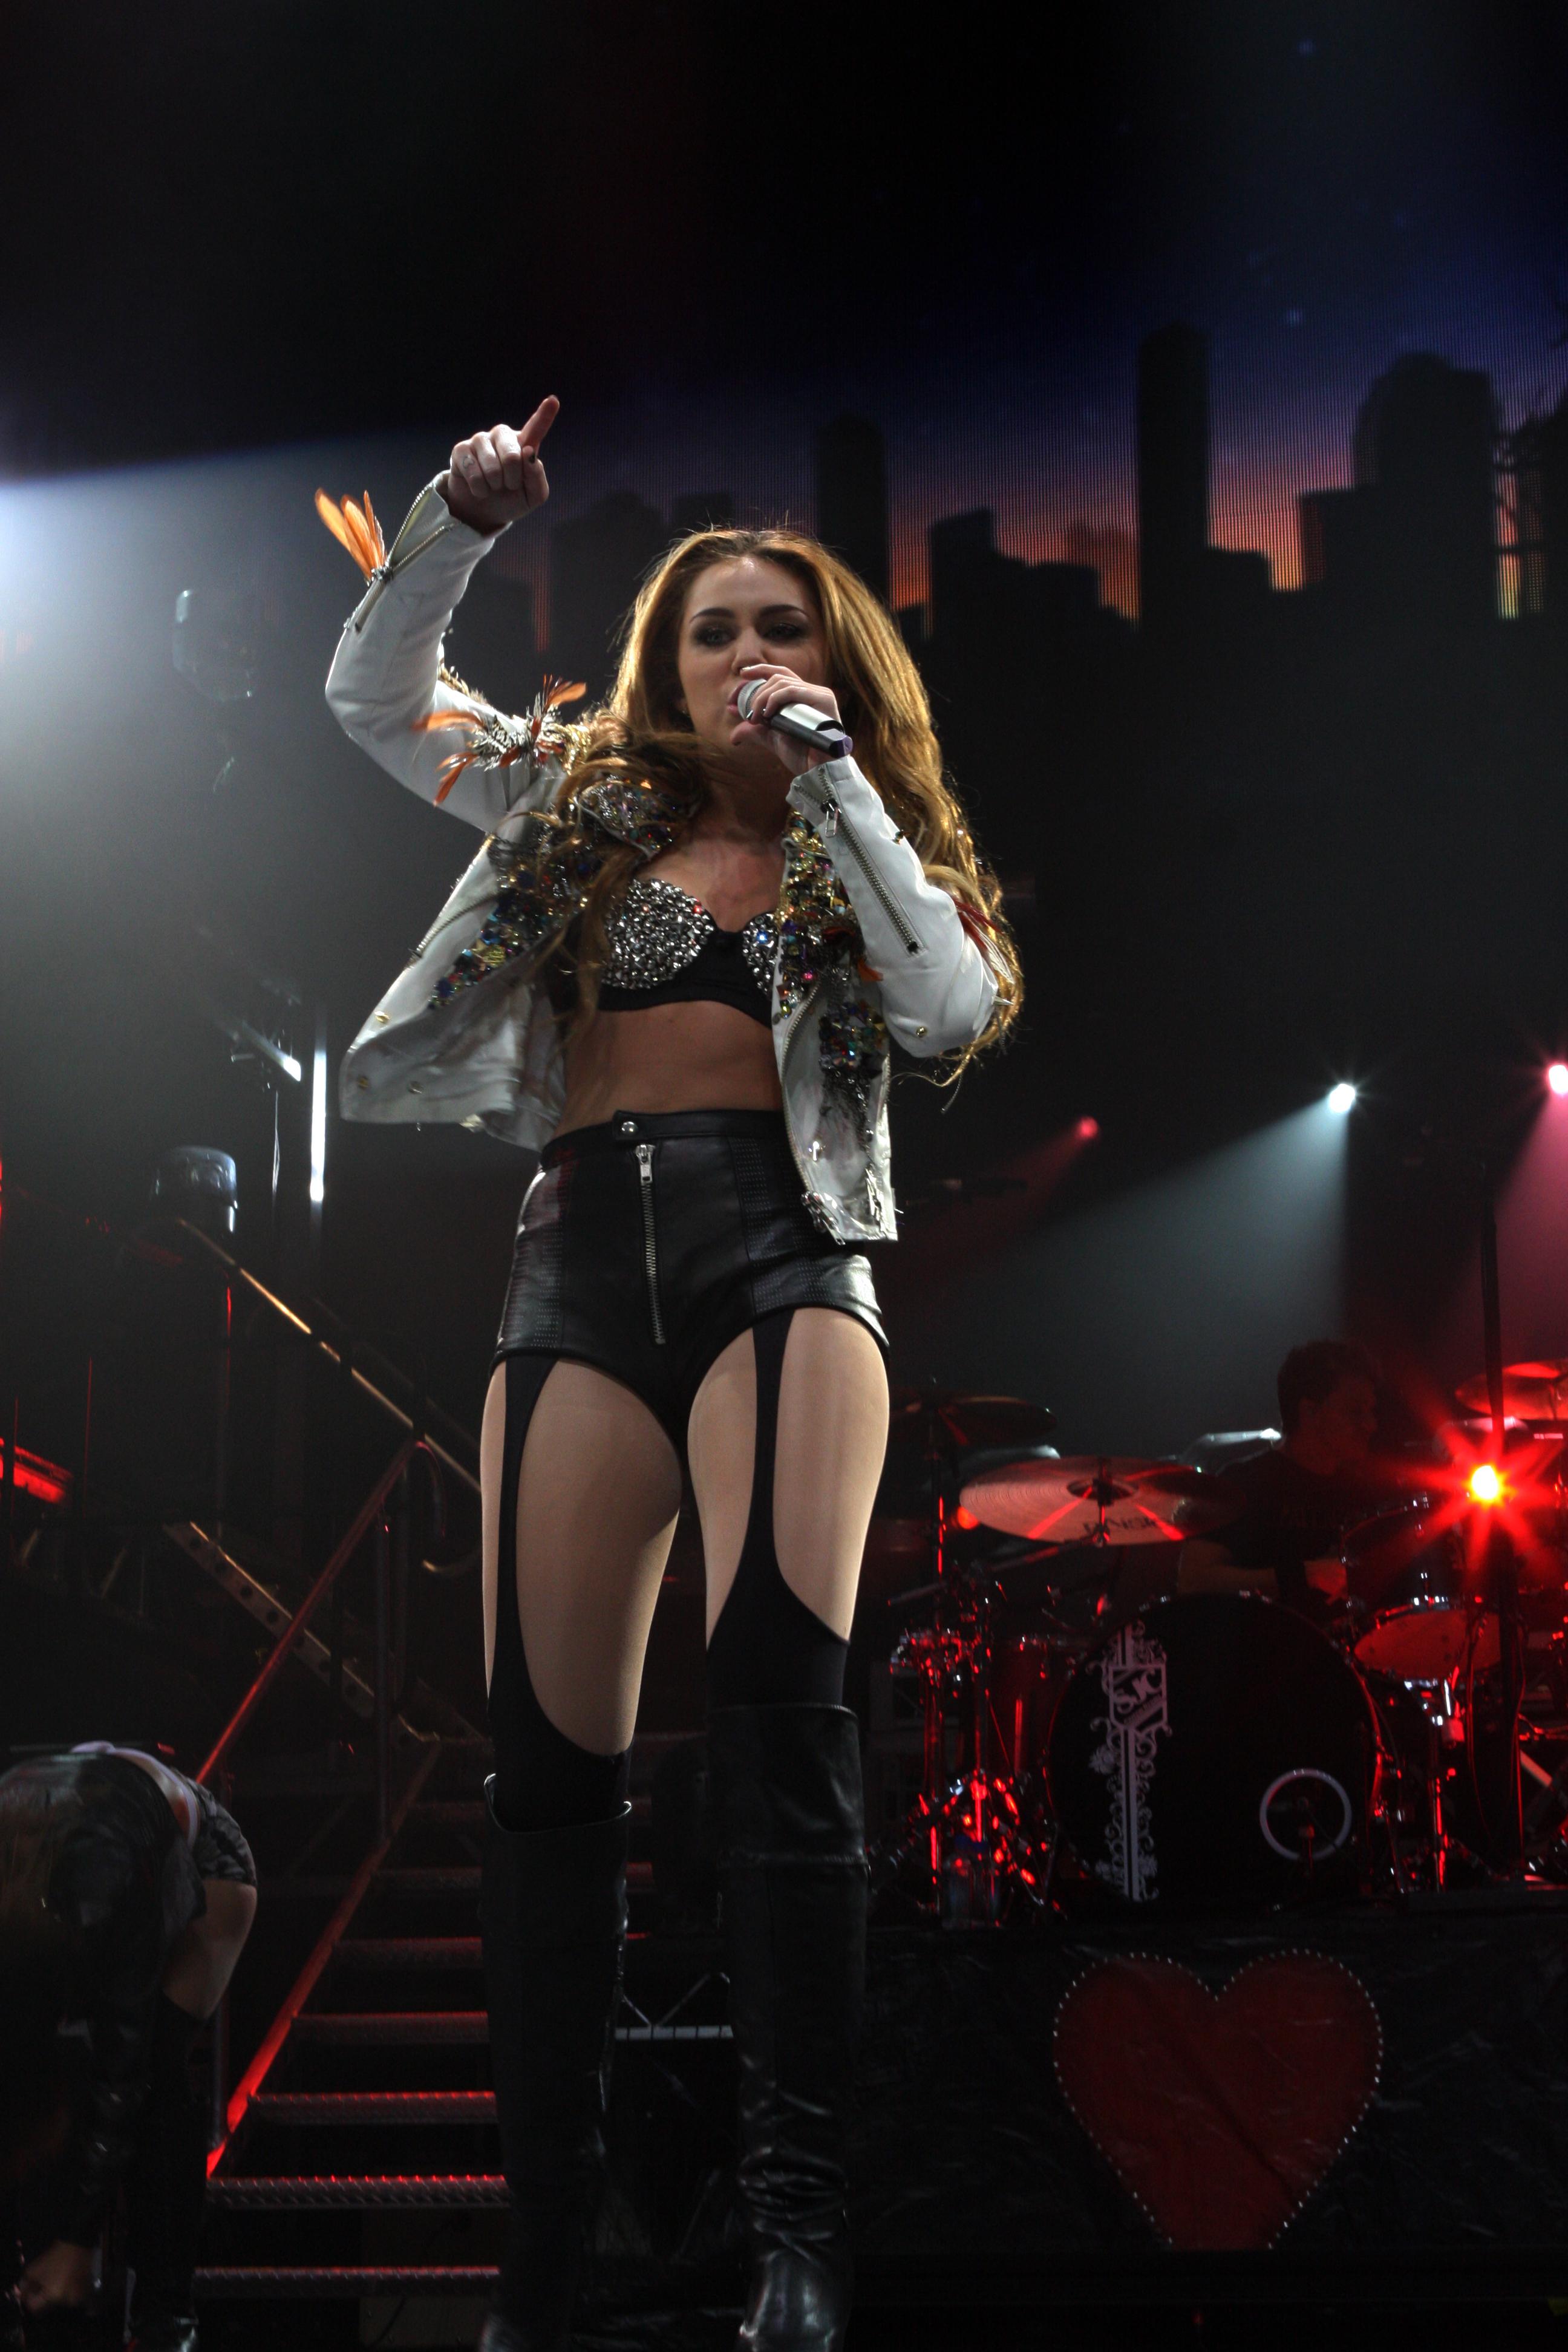 Miley Cyrus Gypsy Heart Tour Australia